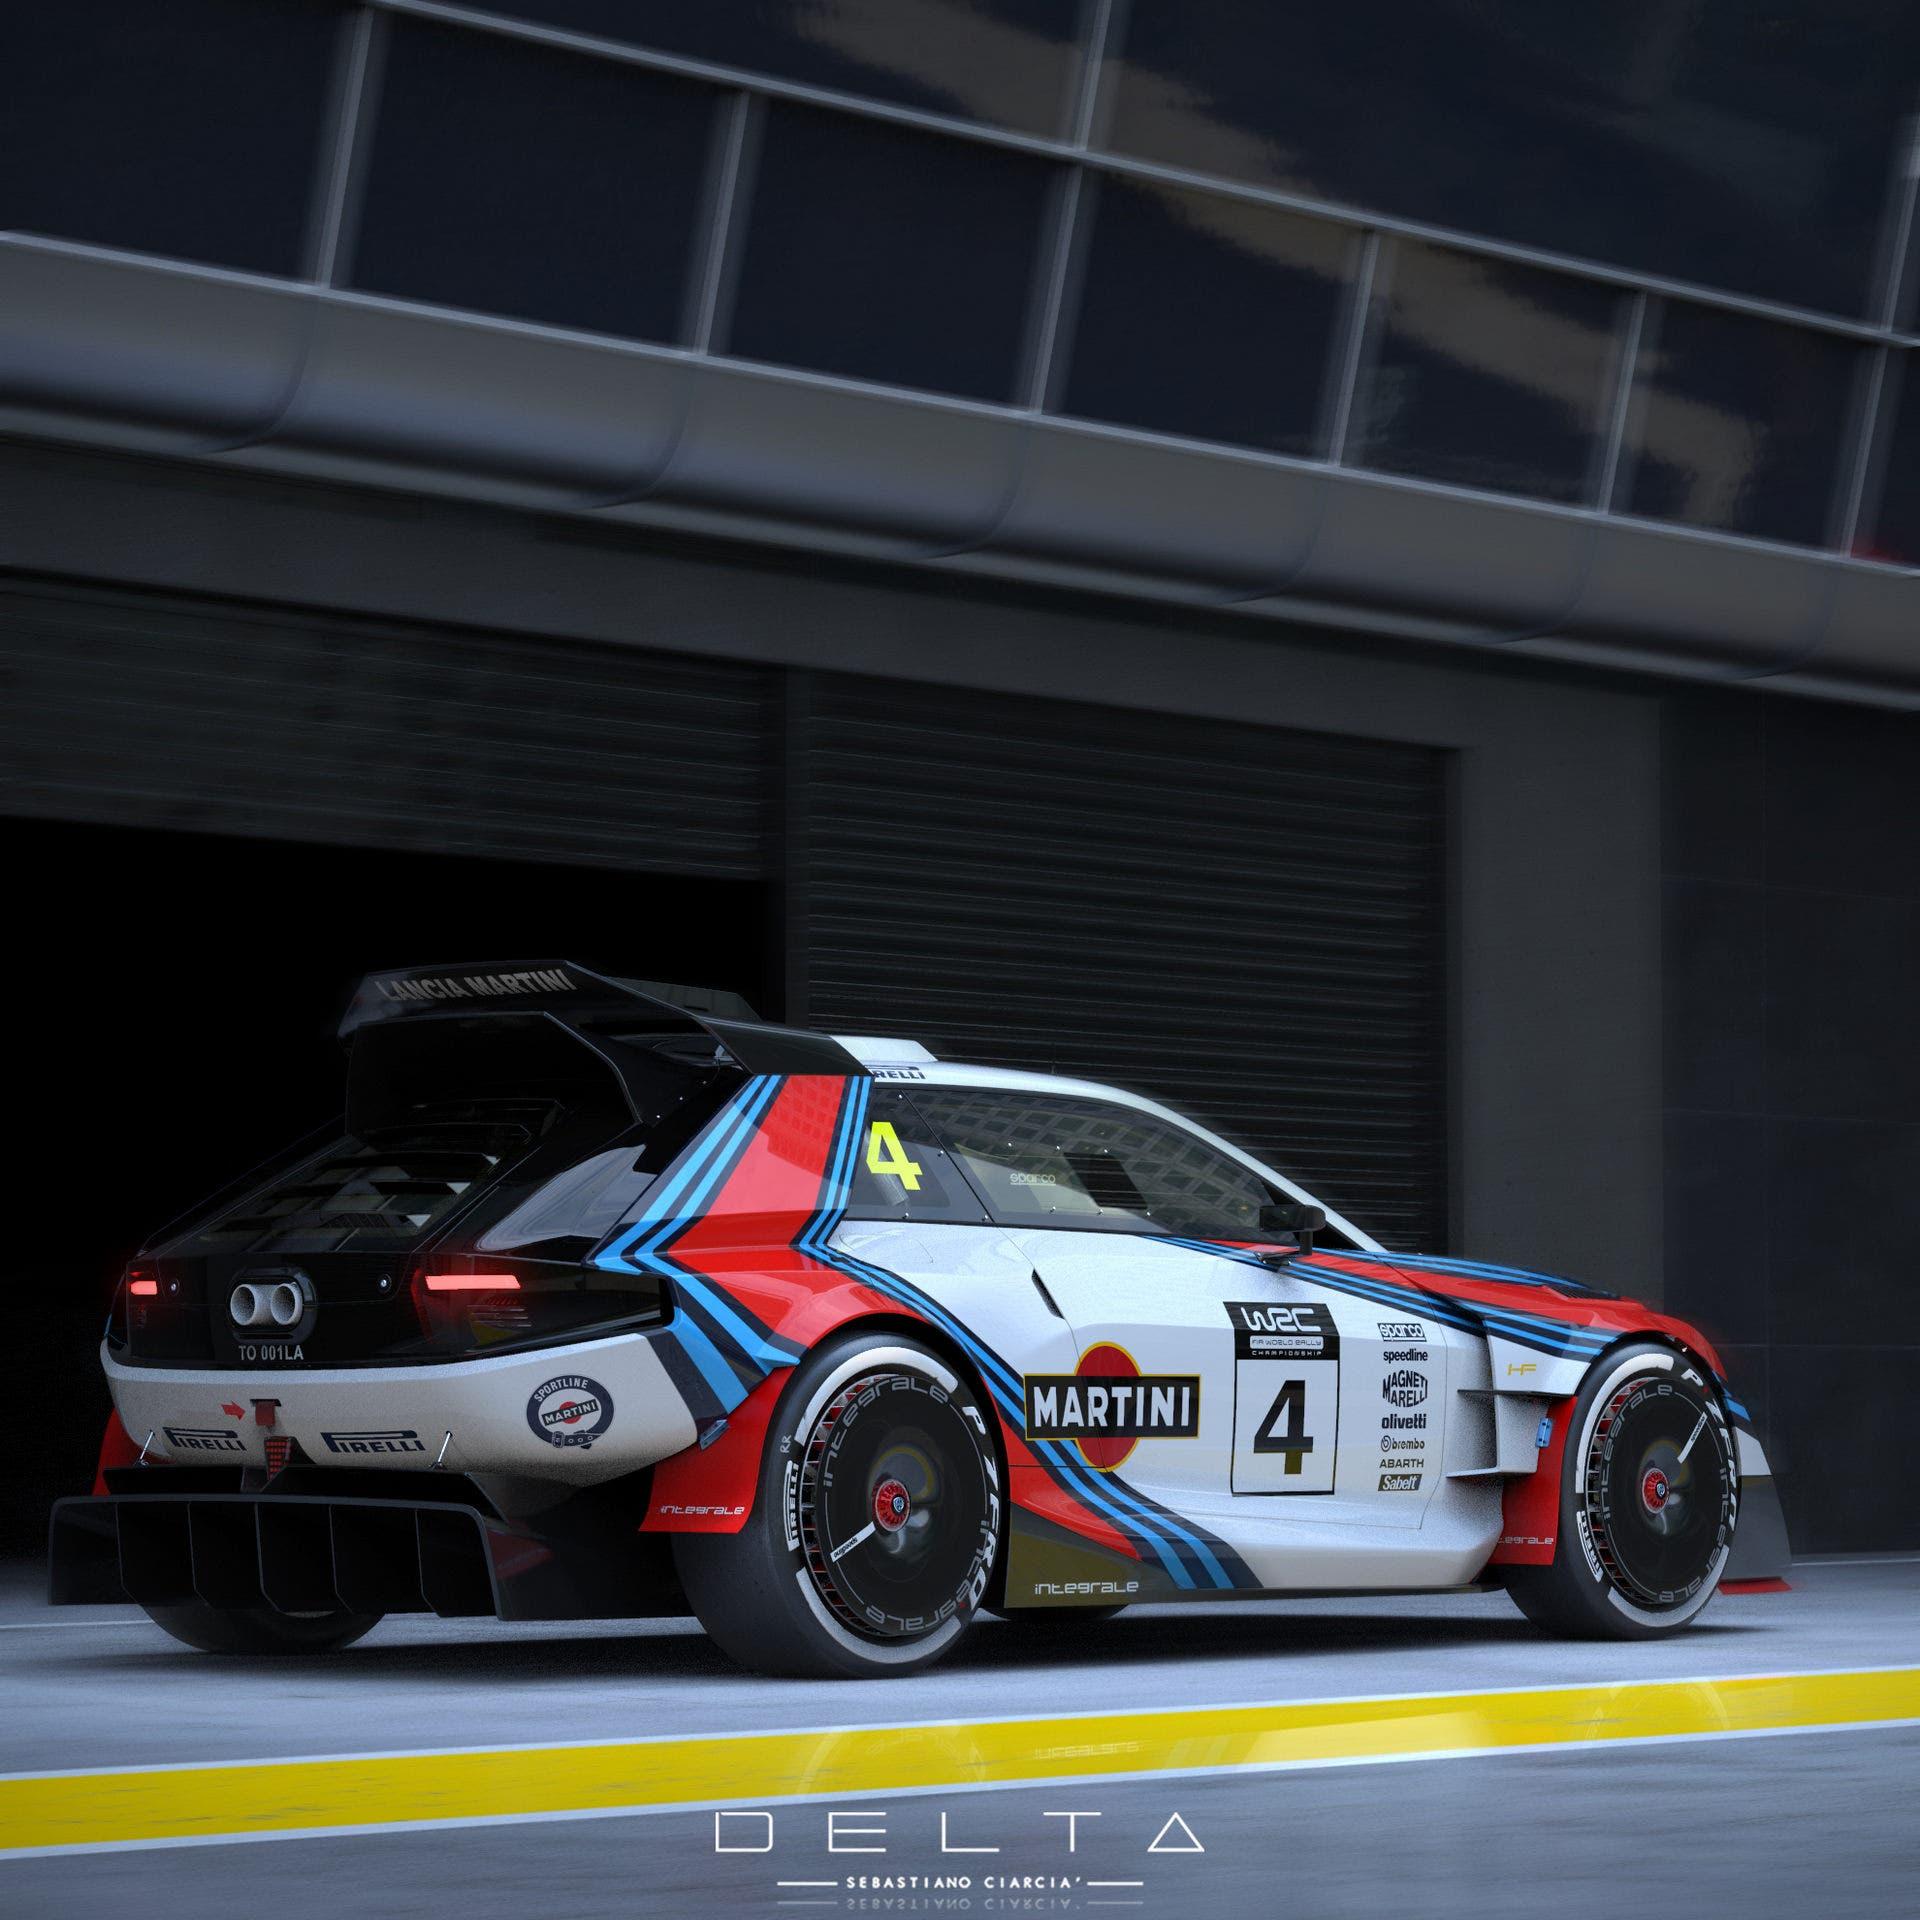 Lancia Delta HF Integrale Martini moderna